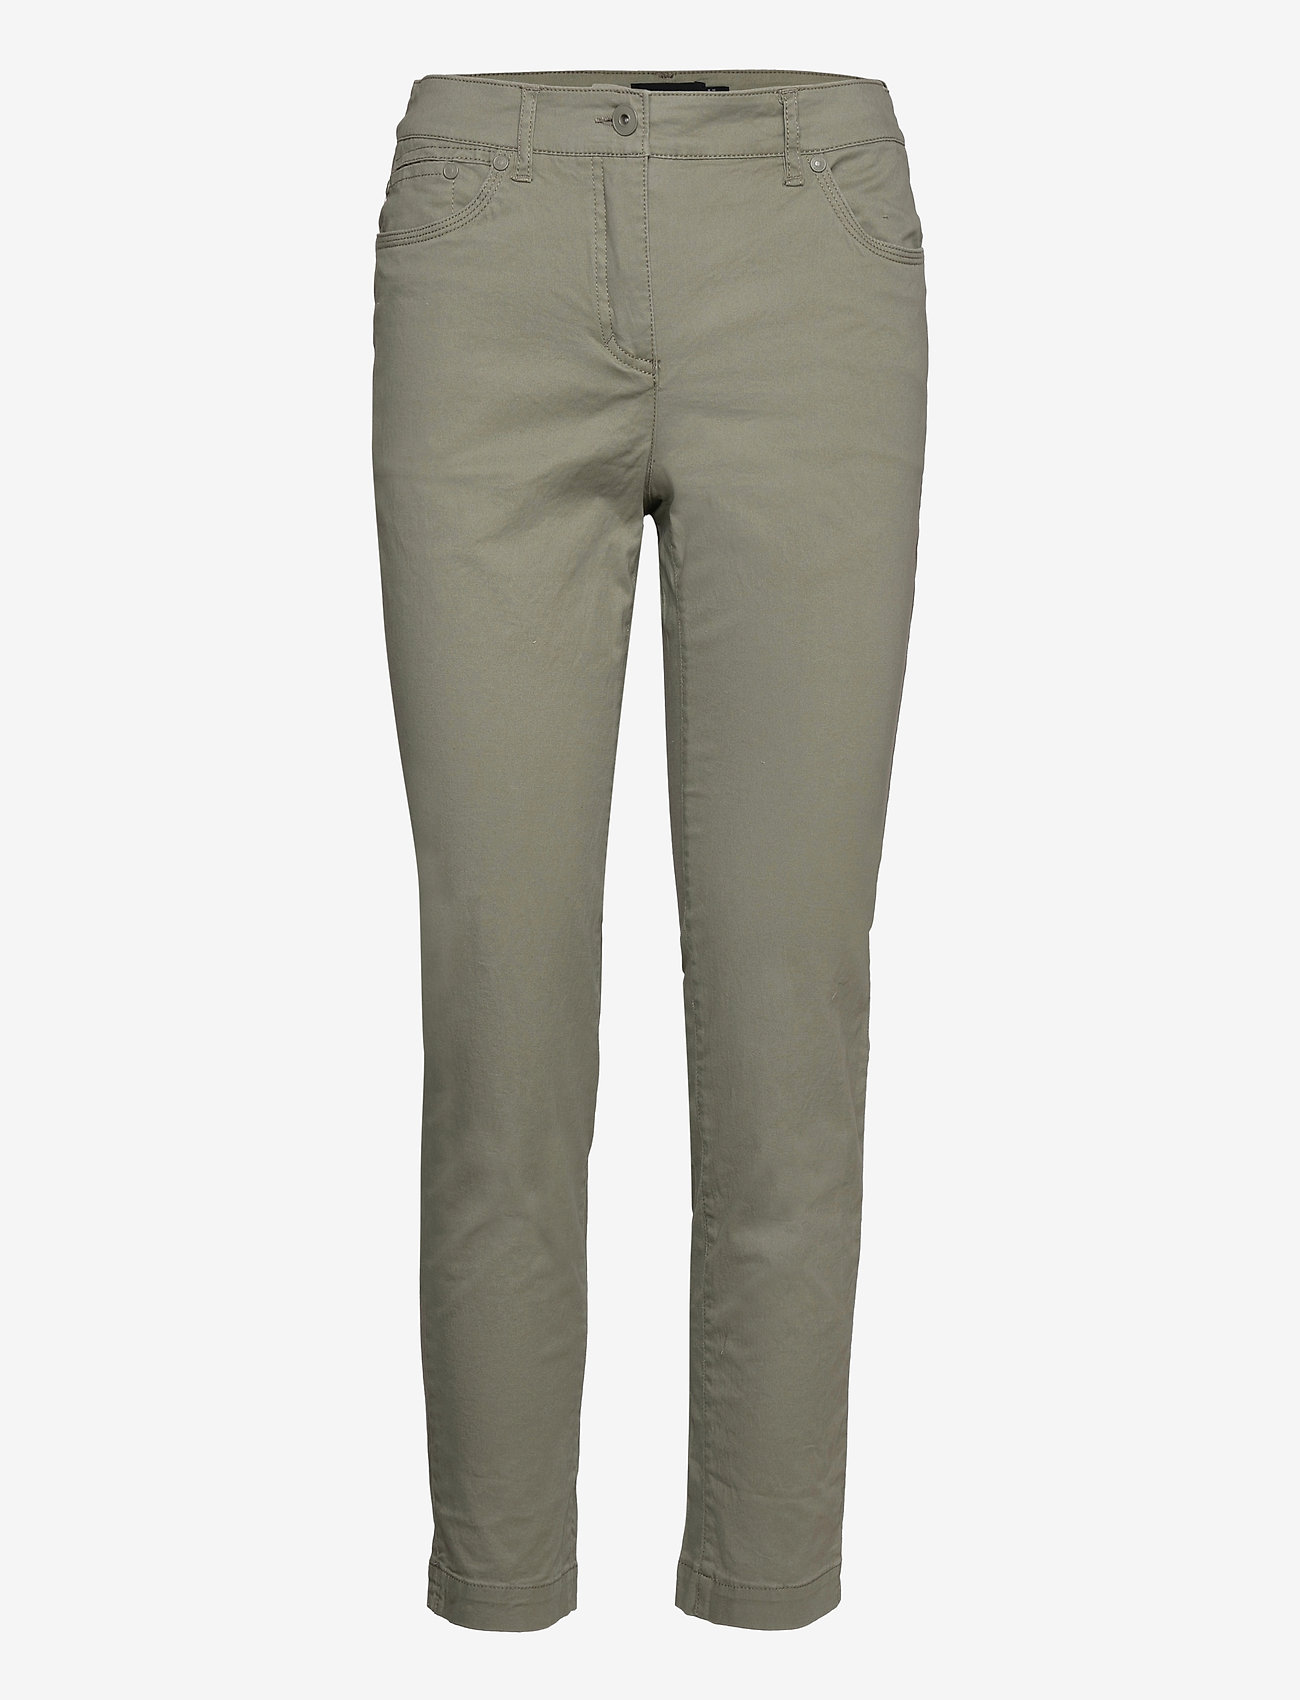 Brandtex - Casual pants - slim fit bukser - deep lichen green - 1